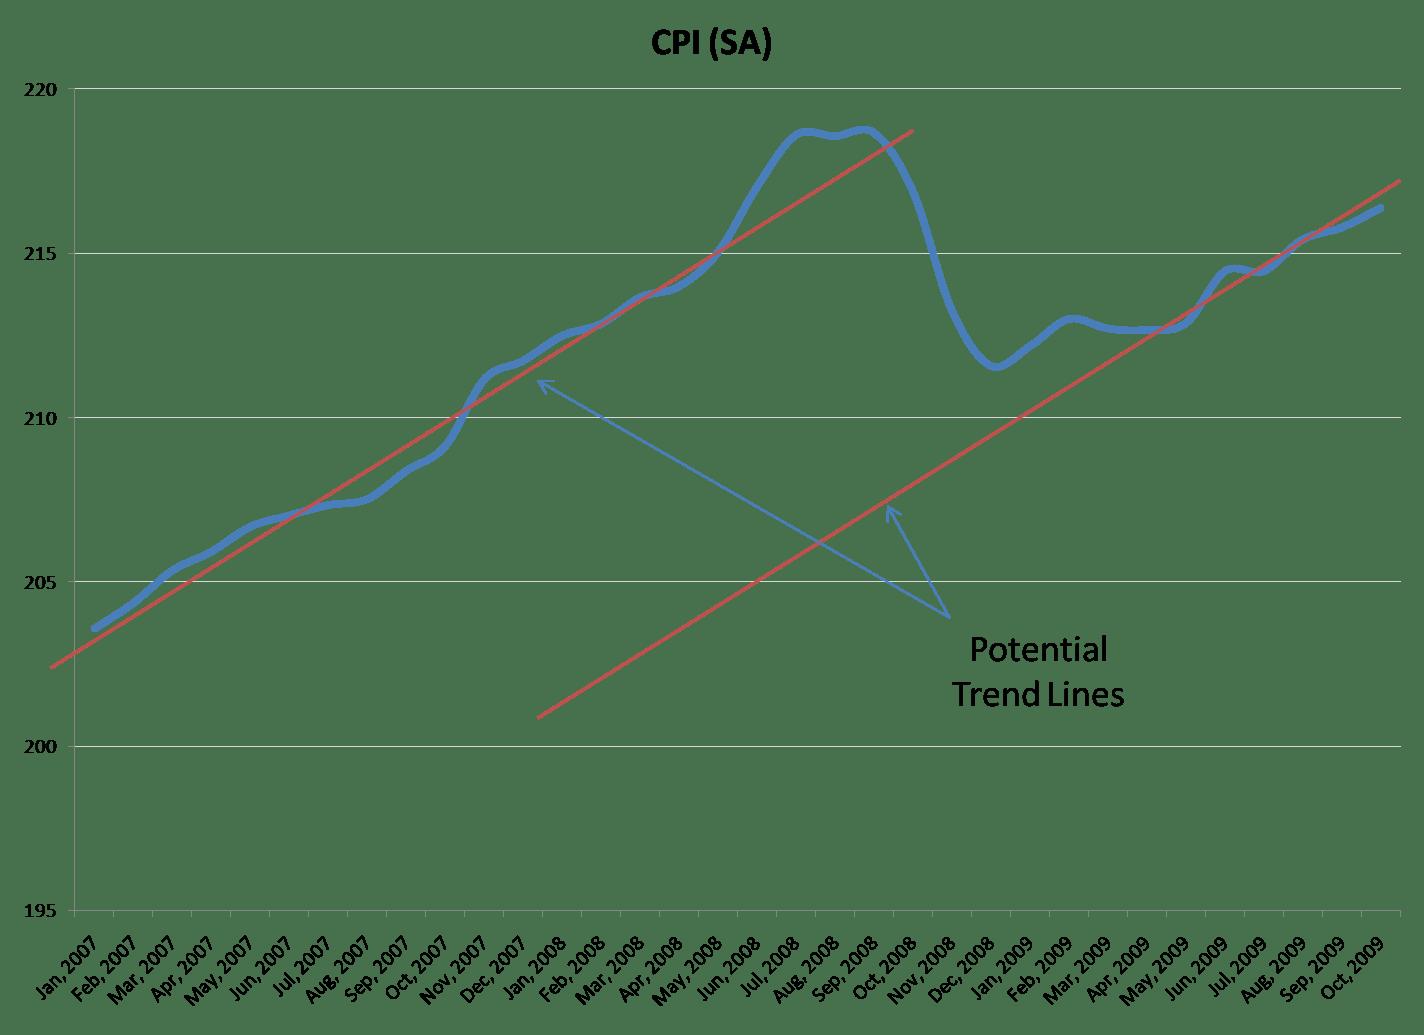 Historical Consumer Price Index Graph